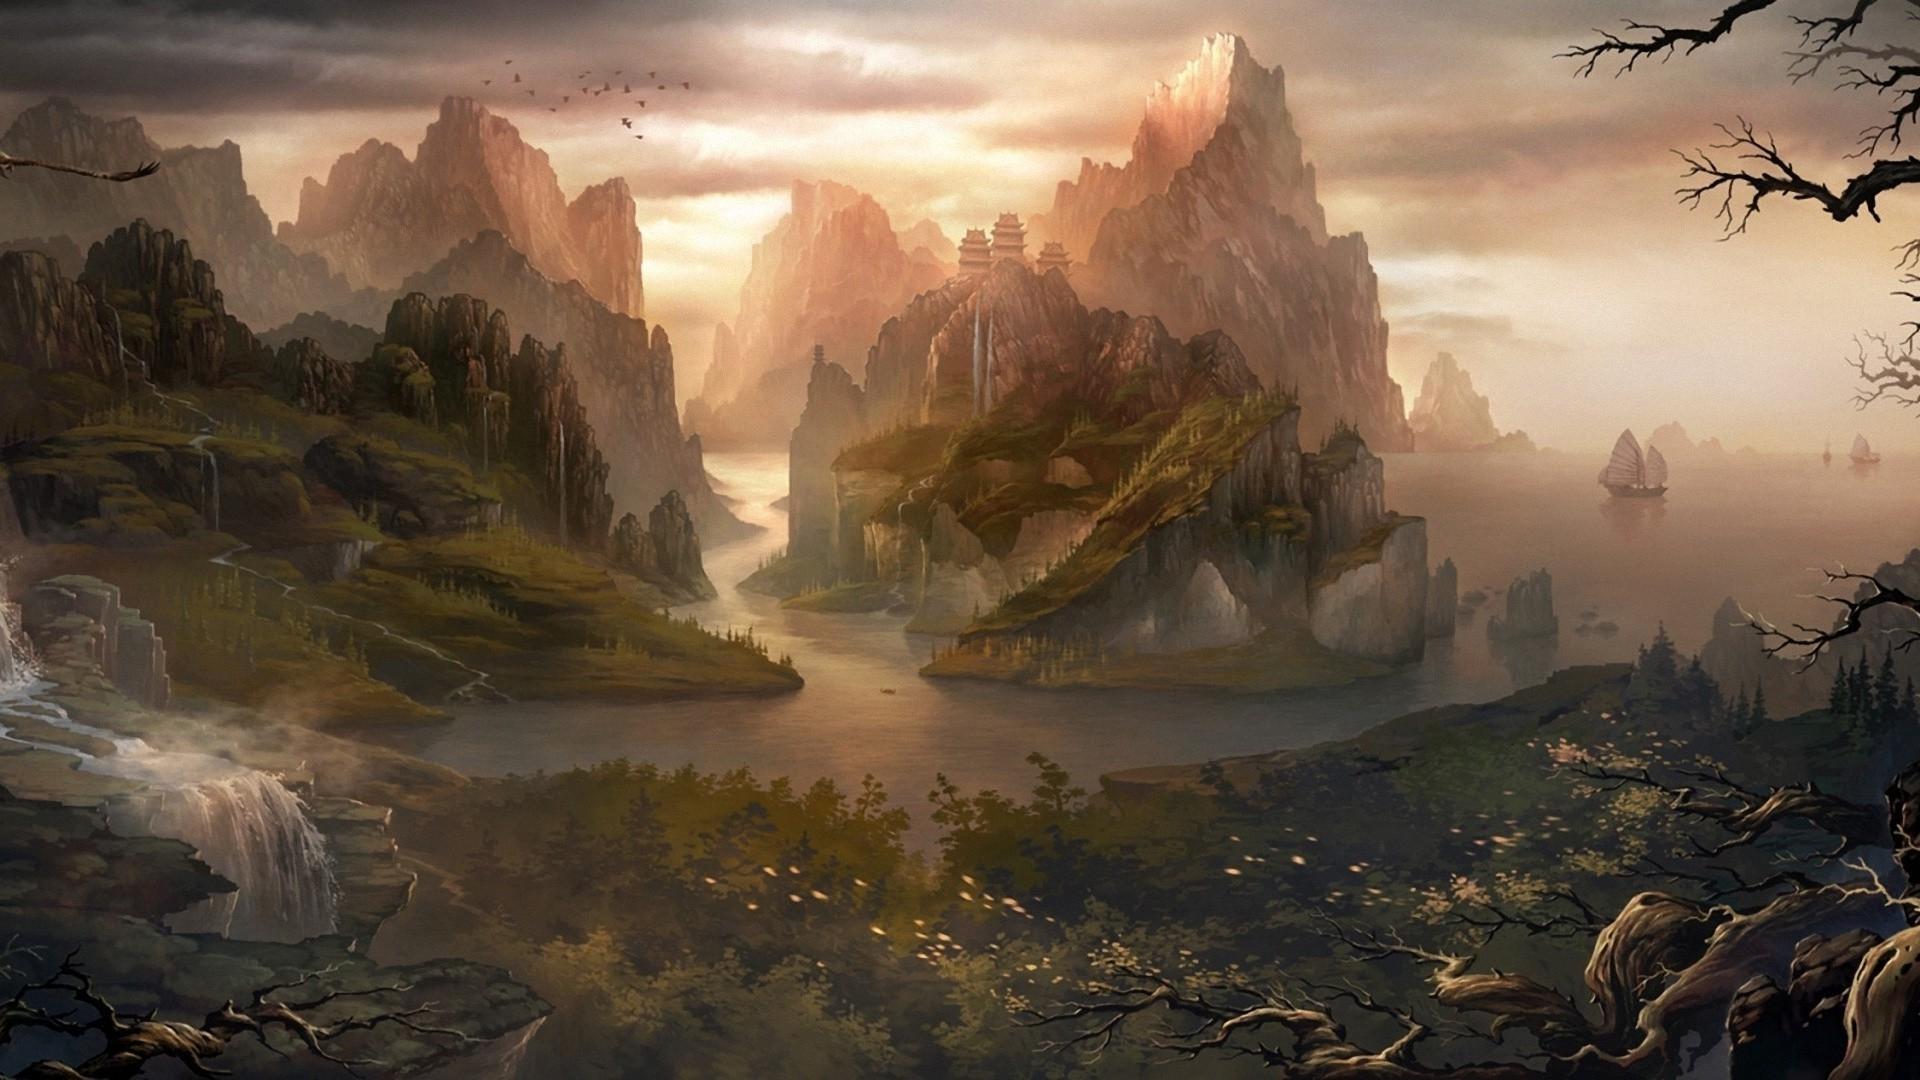 14 best fantasy images on Pinterest | Landscapes, Places and Fantasy art